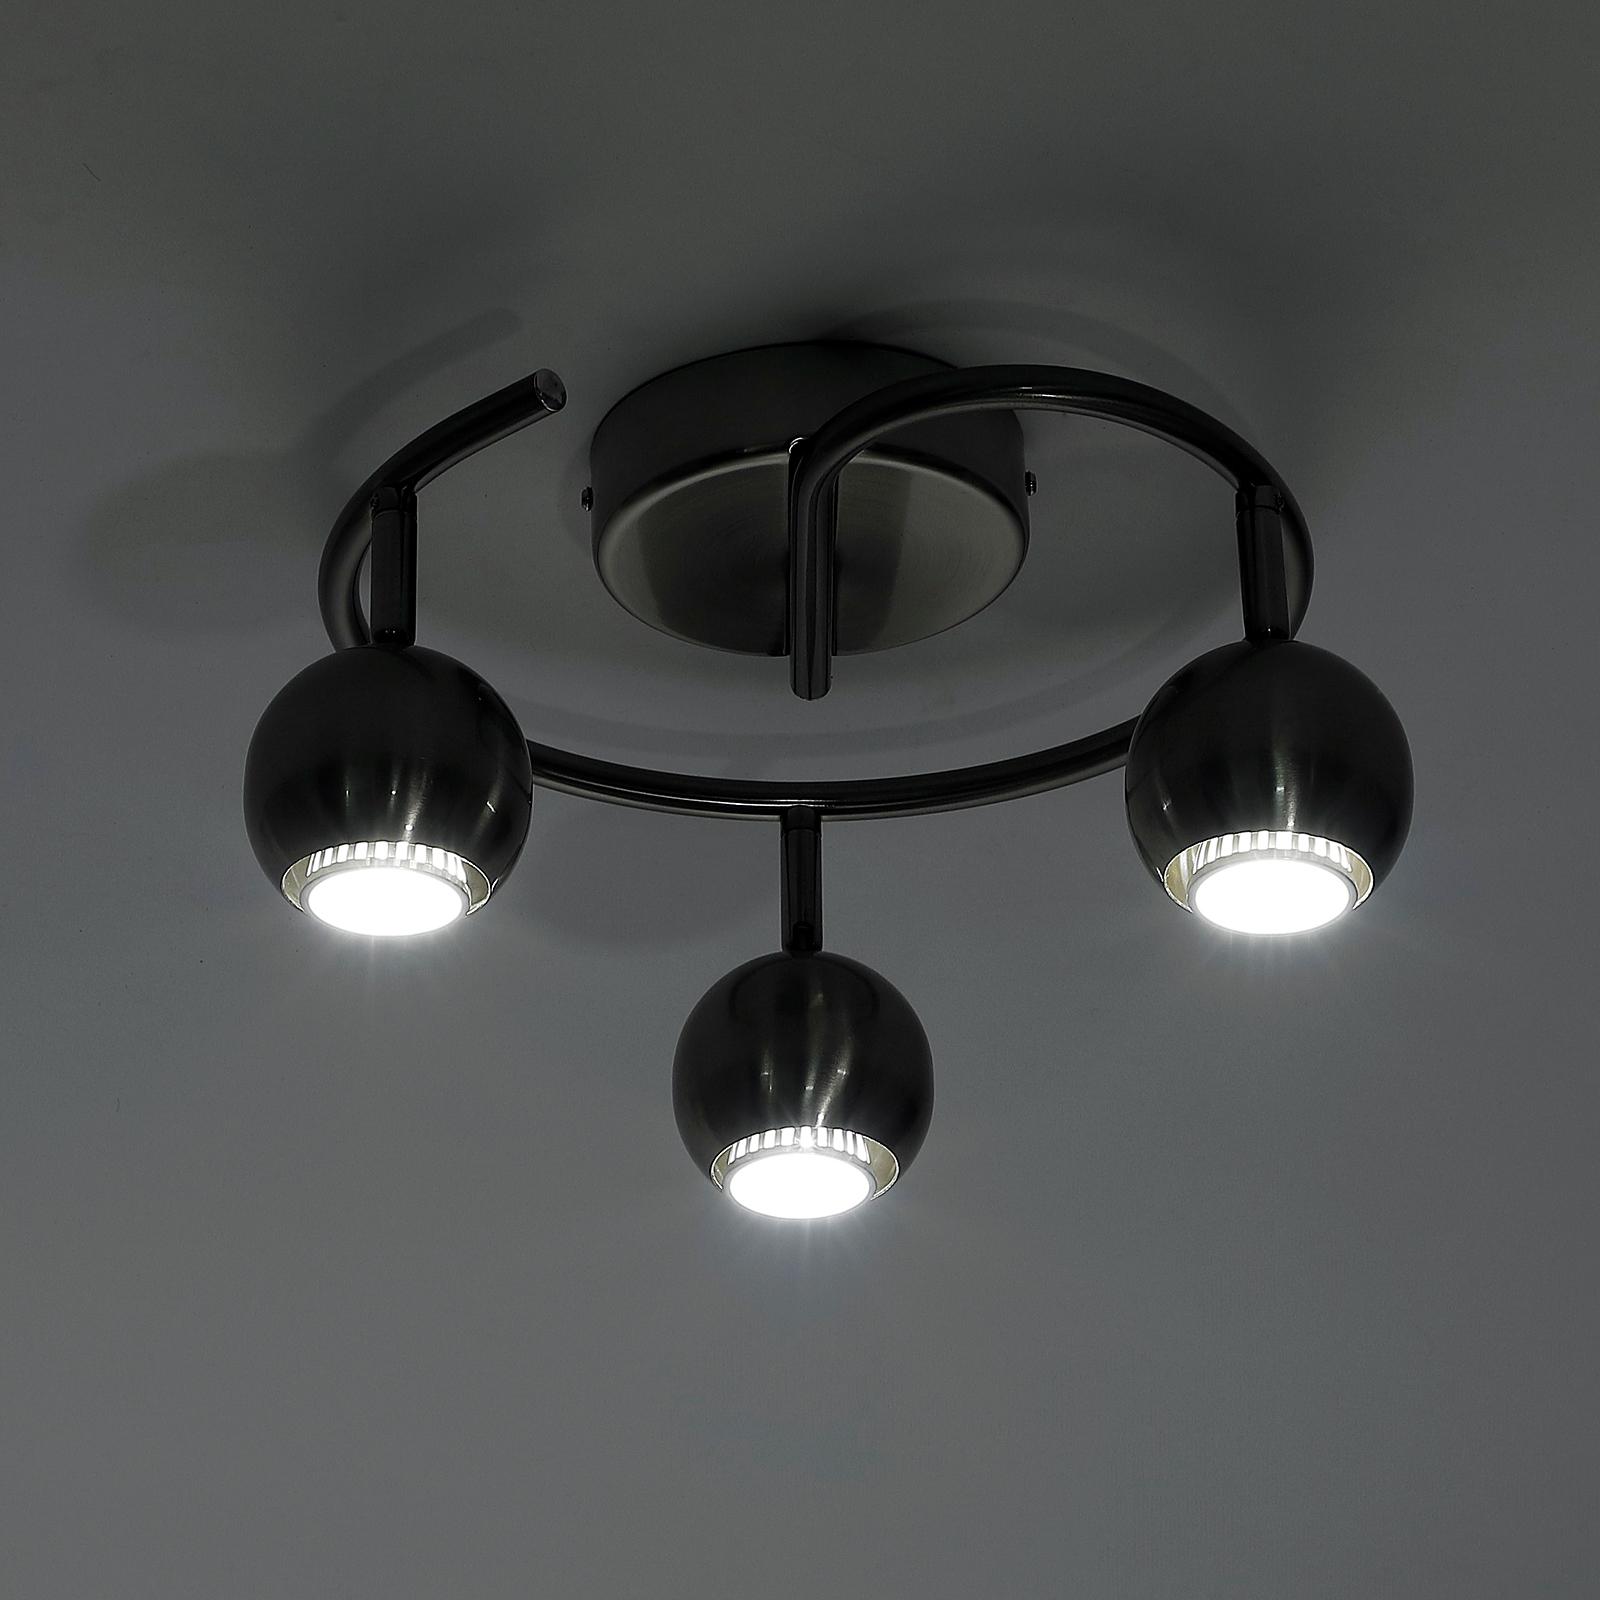 Image of EUR22,99 HomCom Lámpara de Techo Focos Giratorios Luces LED Moderno 3 Bombillas GU10 40W Black Friday B31-106 8435428738037